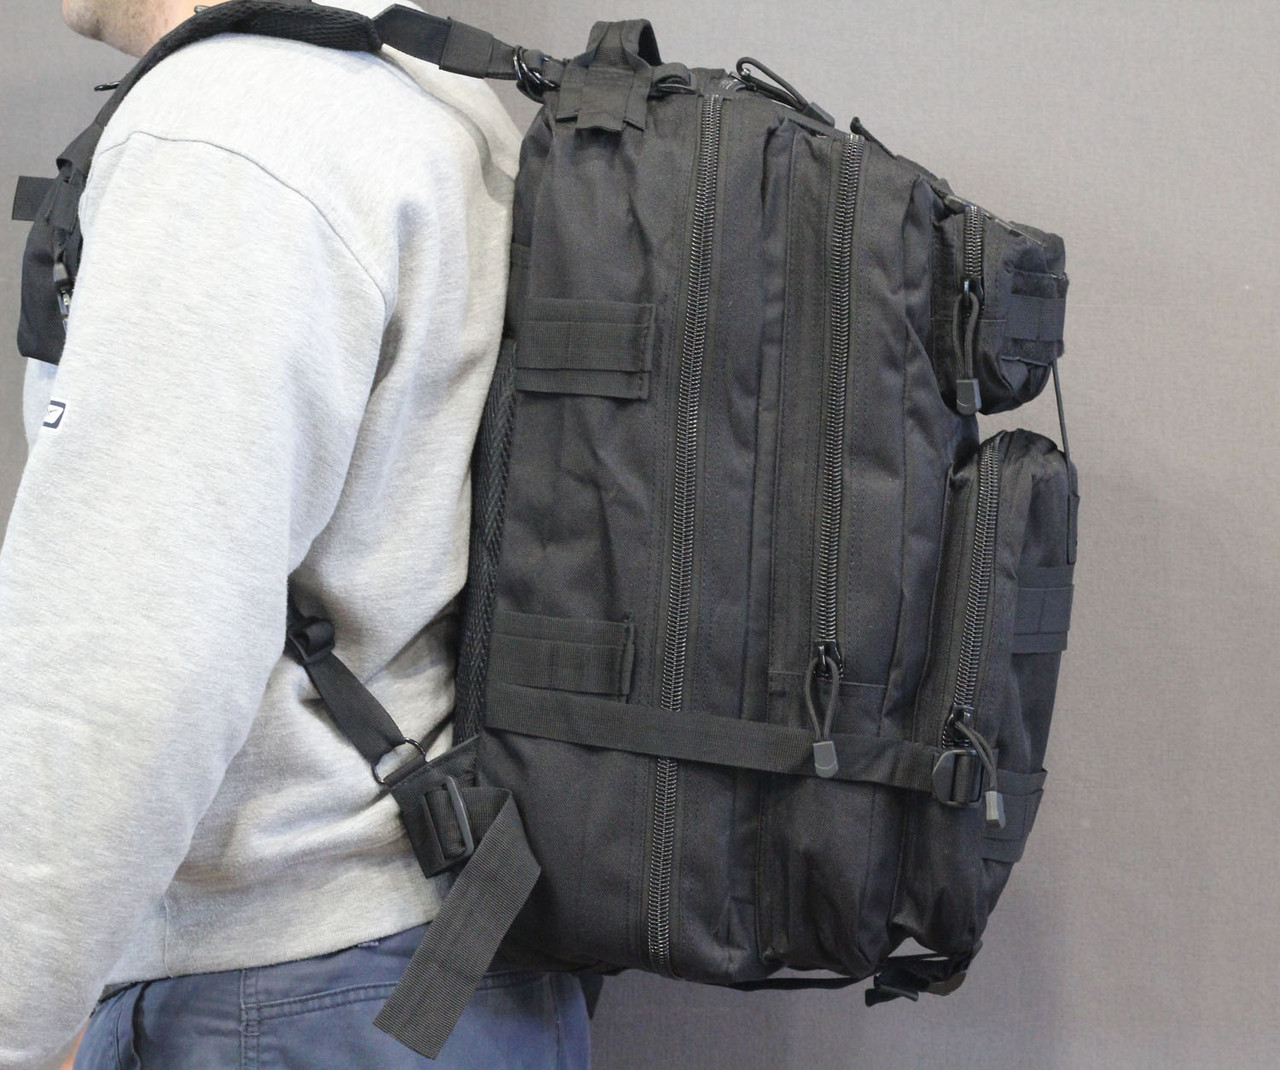 Тактический (городской) рюкзак Oxford 600D с системой M.O.L.L.E 40 л.